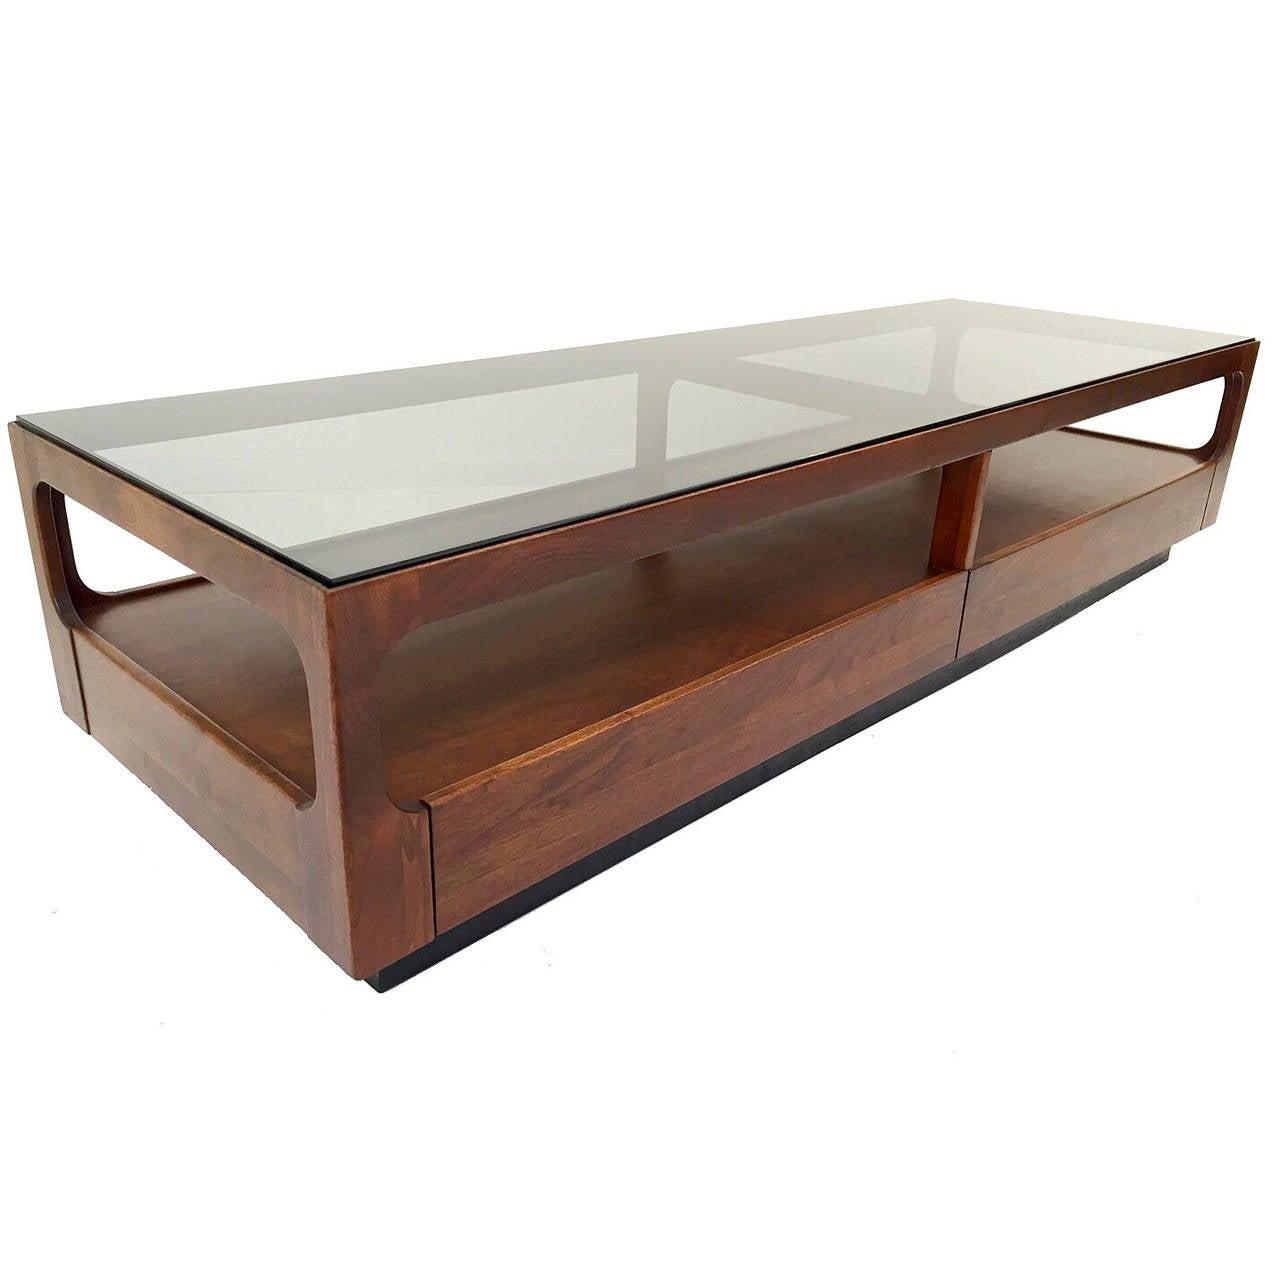 Brown saltman walnut and smoked glass coffee table with for Coffee table with storage and glass top